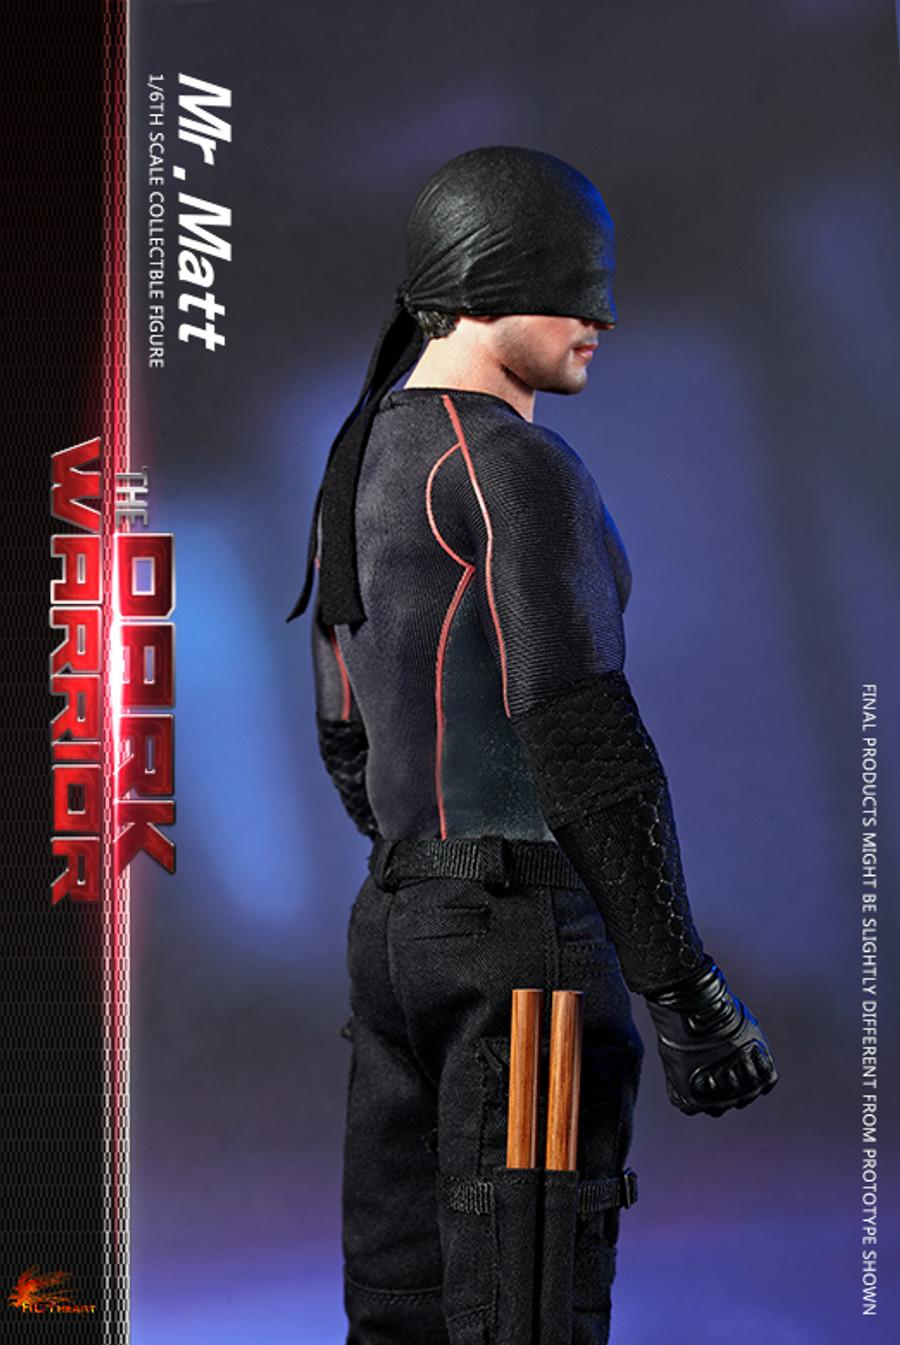 Hot Heart - The Dark Warrior